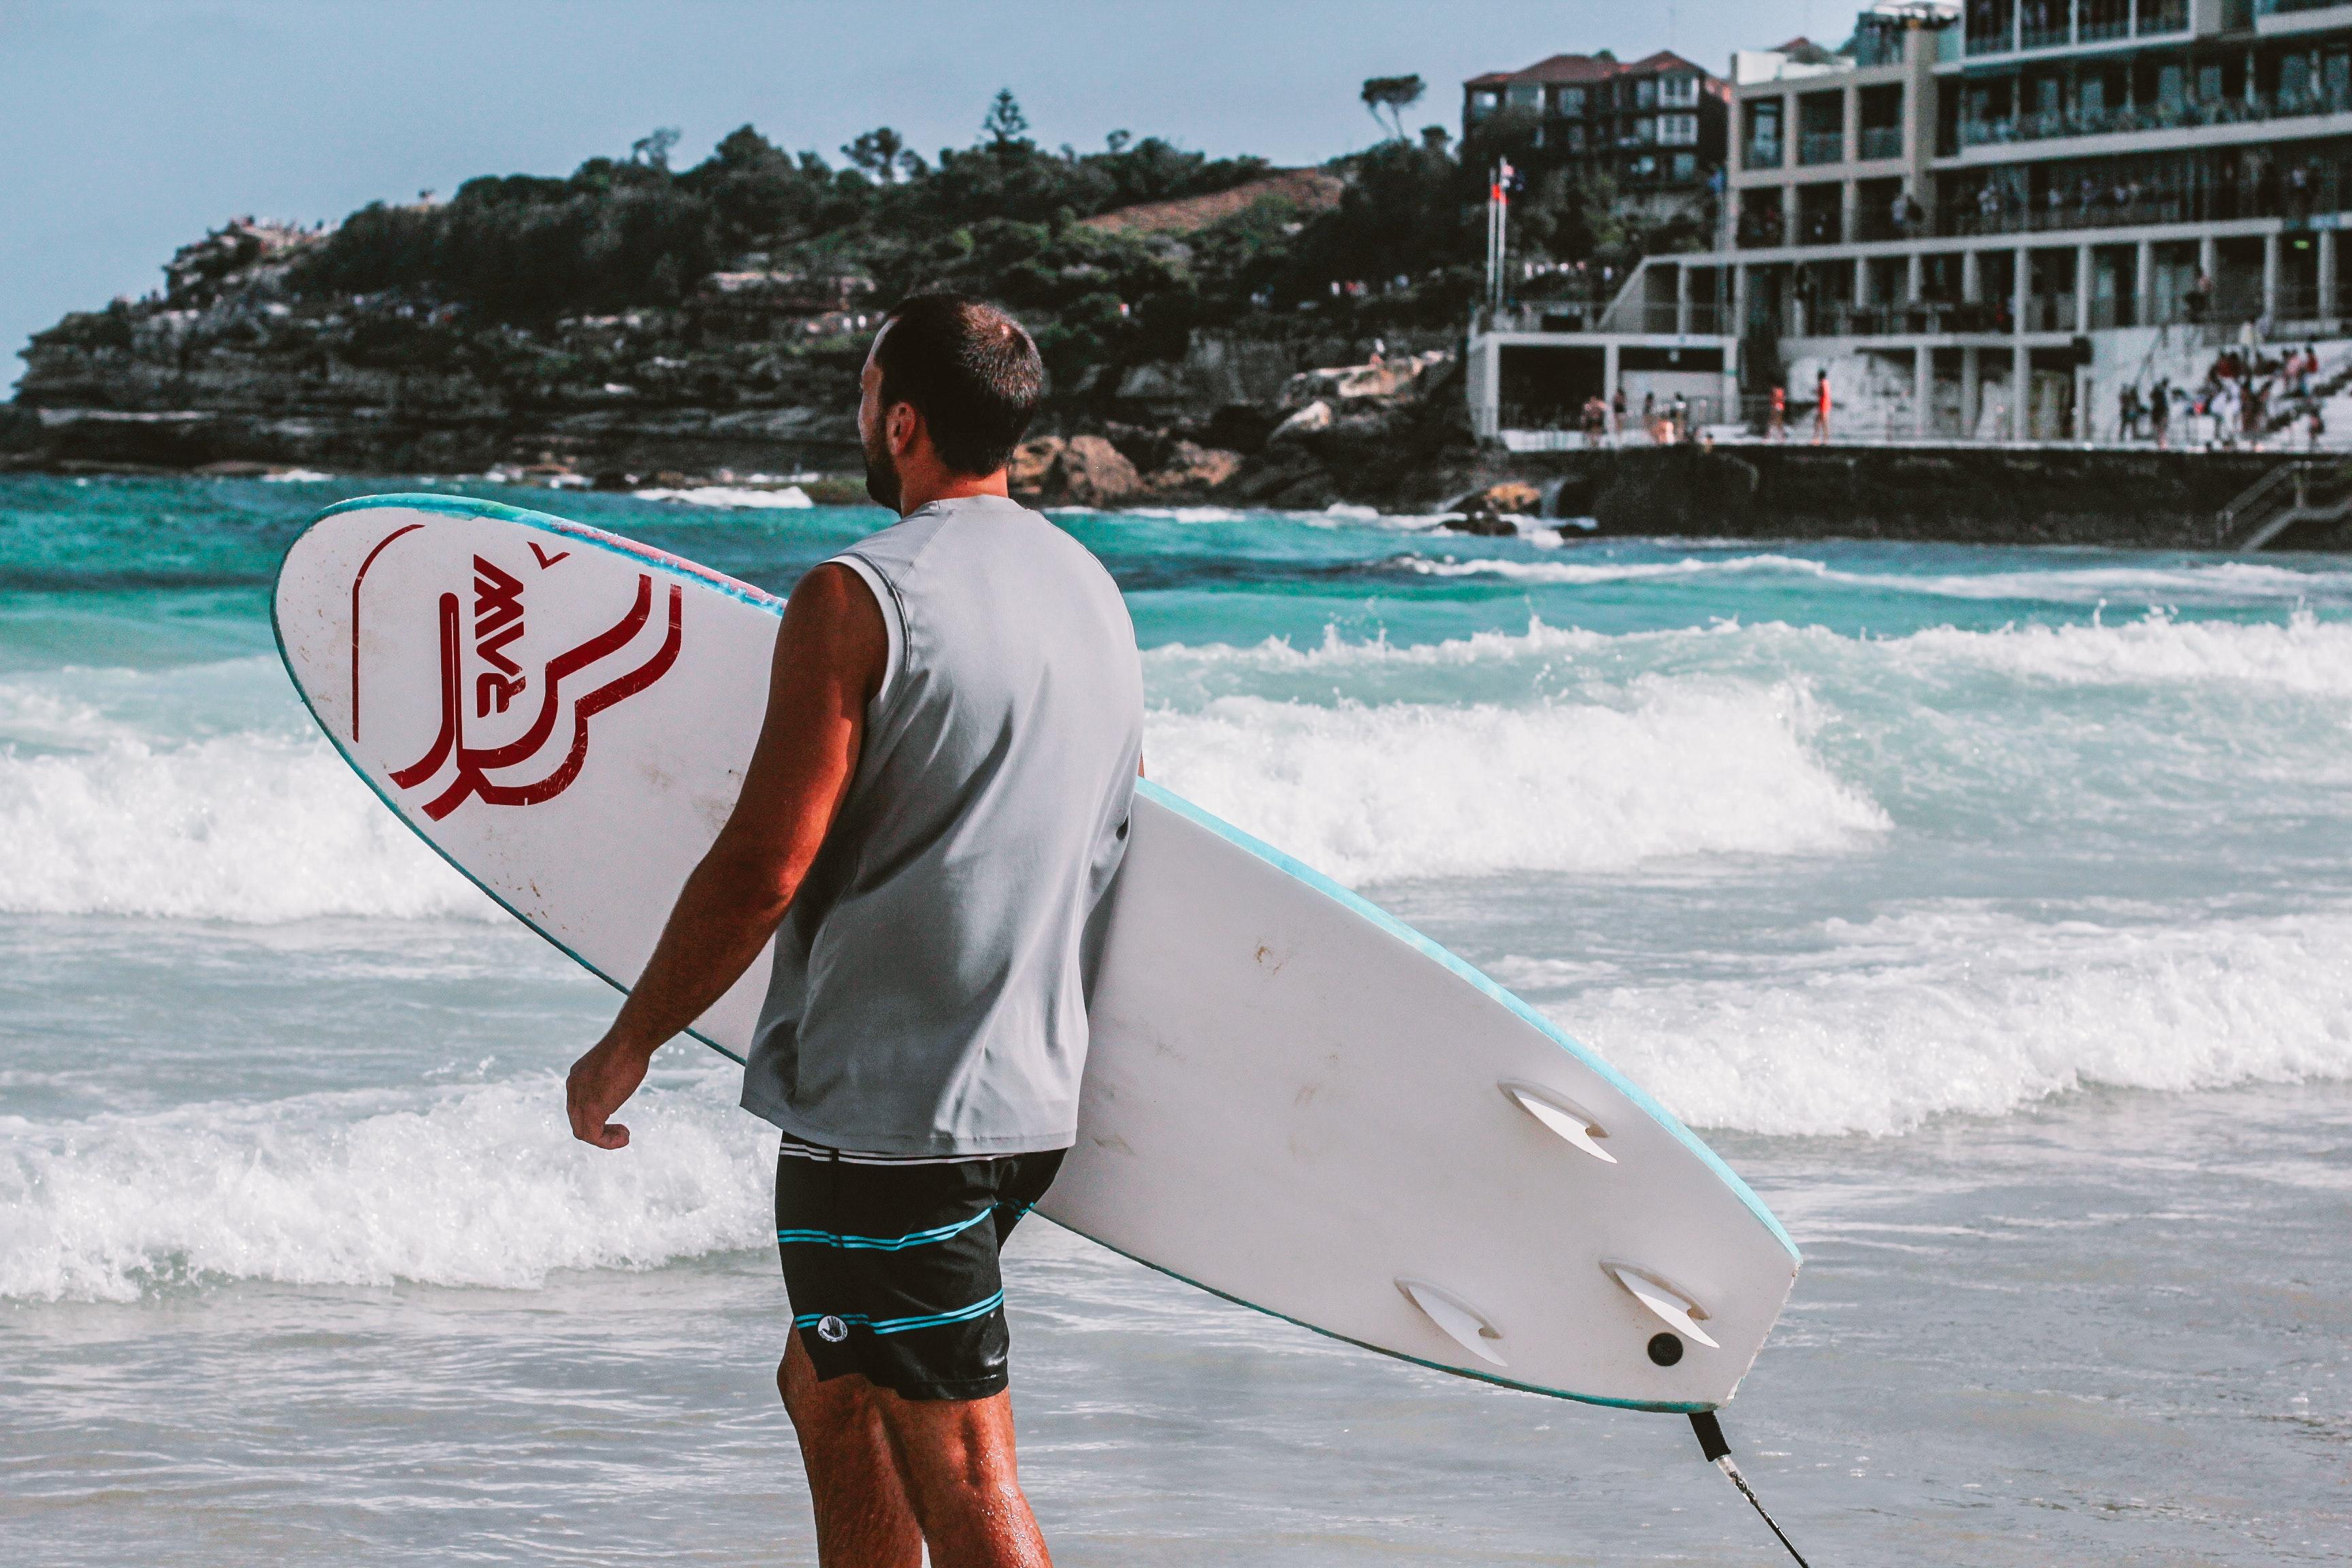 Man Walking Towards Body Of Water Holding A Surfboard, Australia, Sport, Water sports, Water, HQ Photo